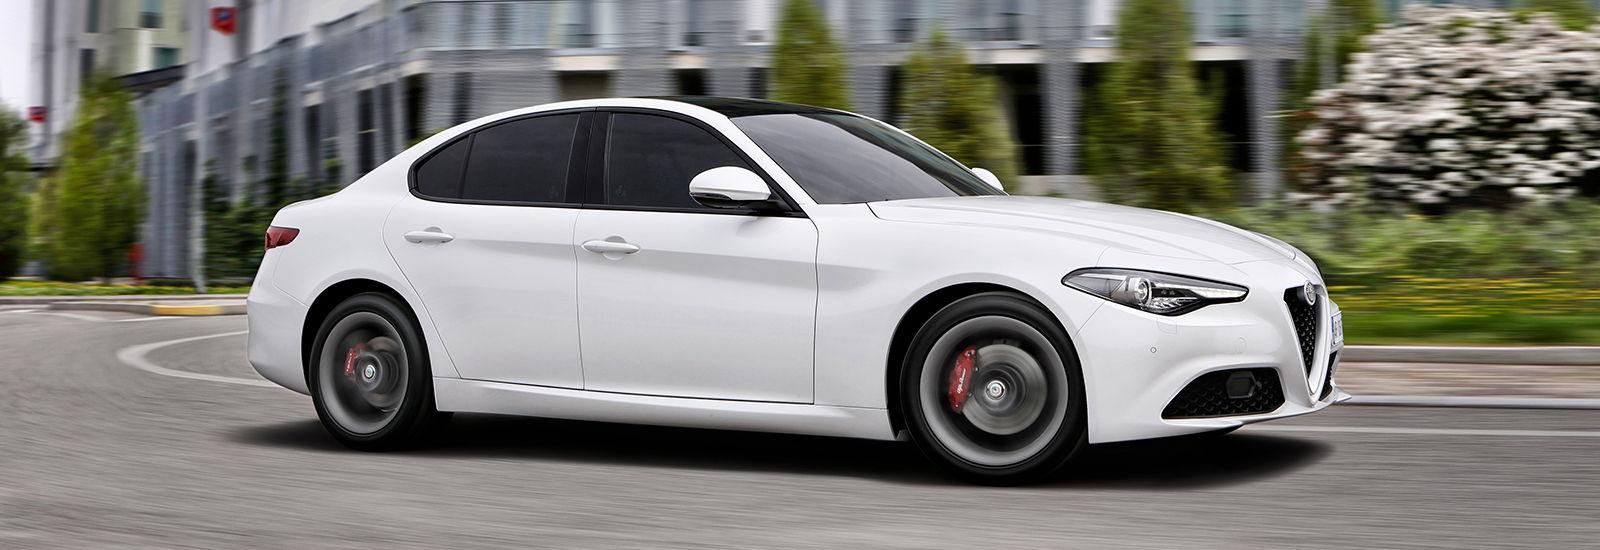 Alfa Romeo Giulia Coupe And Estate Wagon Renders Leaked - Alfa Romeo ...